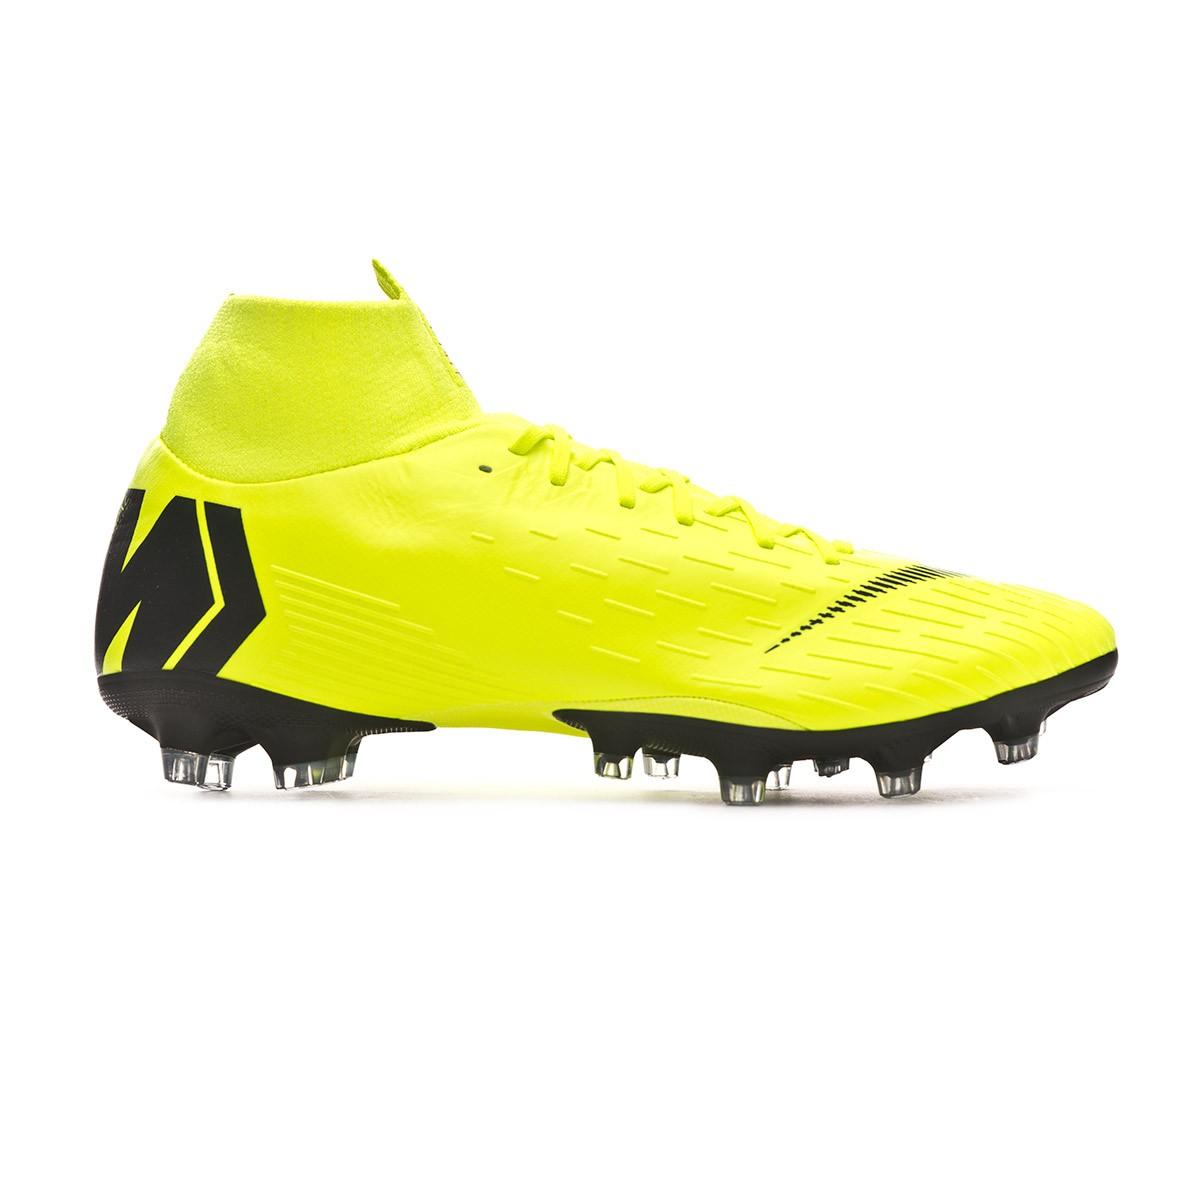 436ed2be43128 Football Boots Nike Mercurial Superfly VI Pro AG-Pro Volt-Black - Tienda de  fútbol Fútbol Emotion